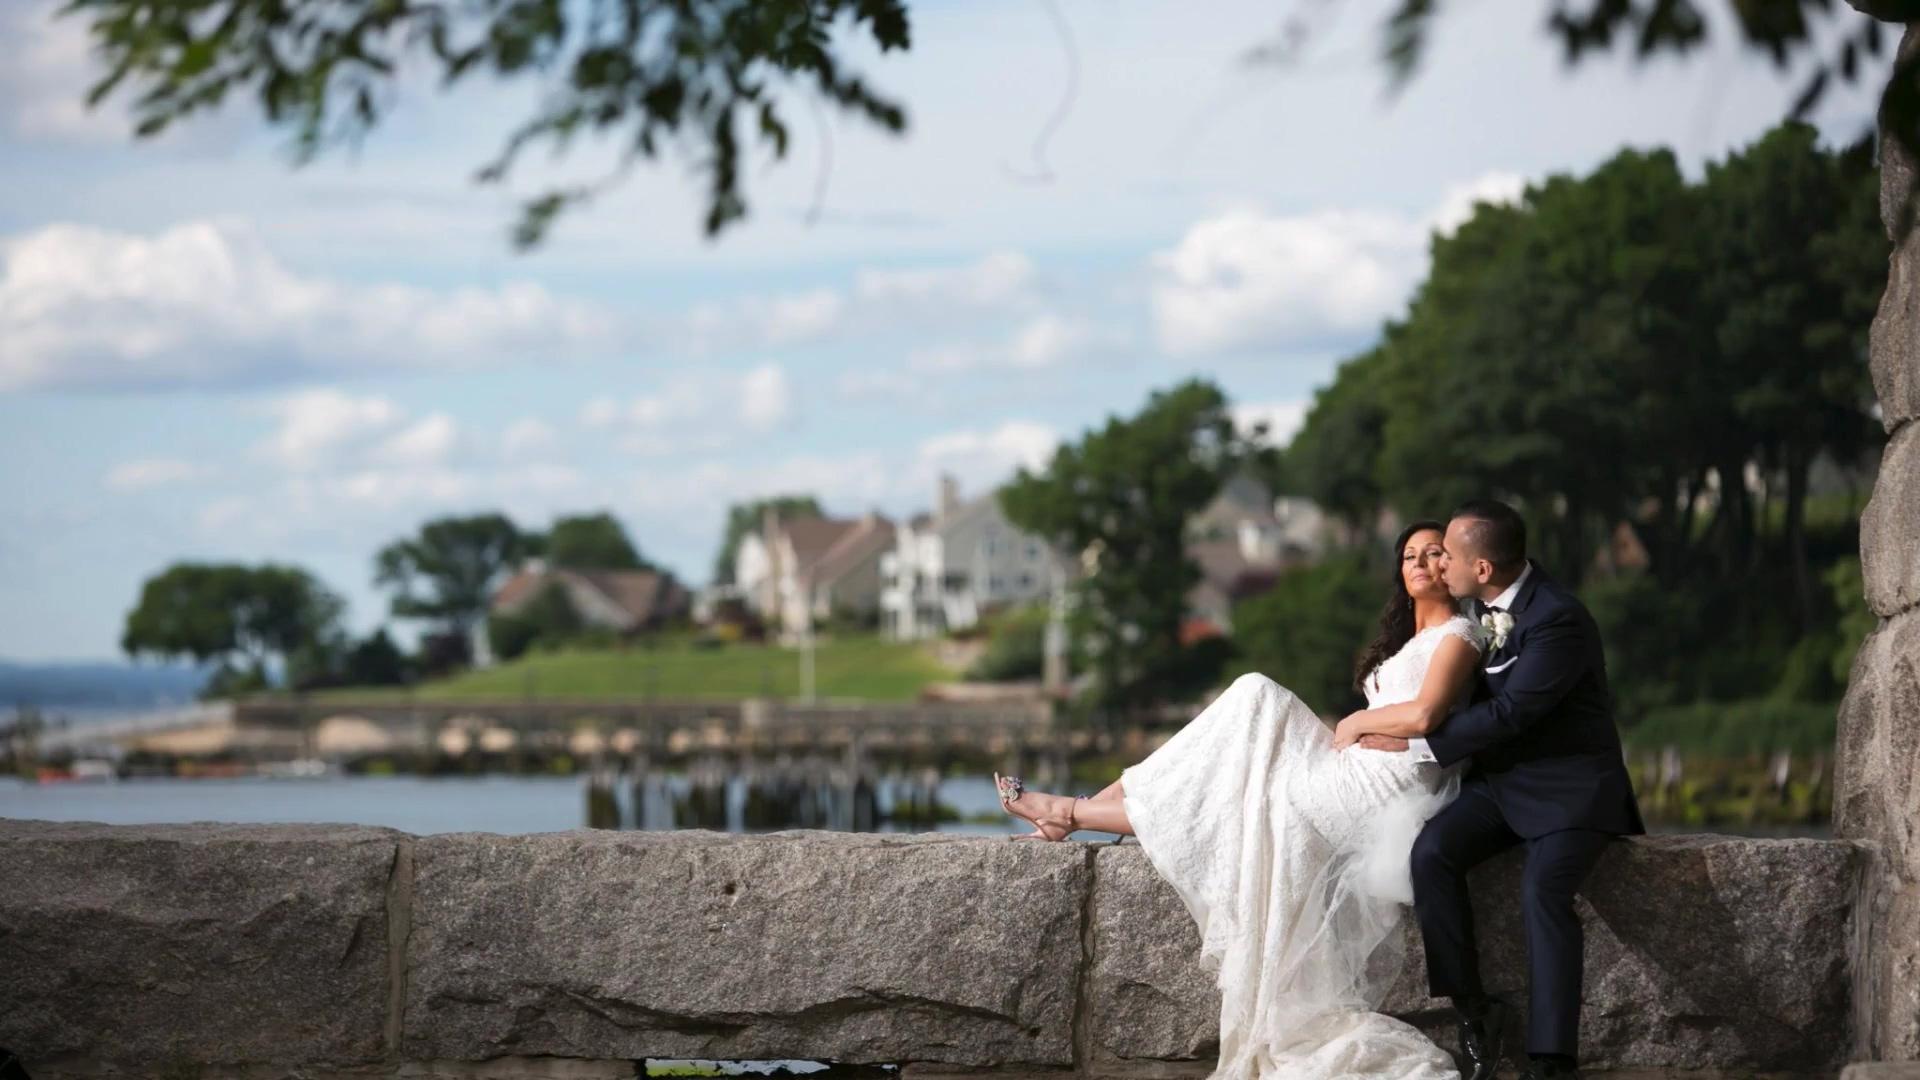 2020_Wedding_Photo_taken_at_Morgan_Memorial_Park_1080p